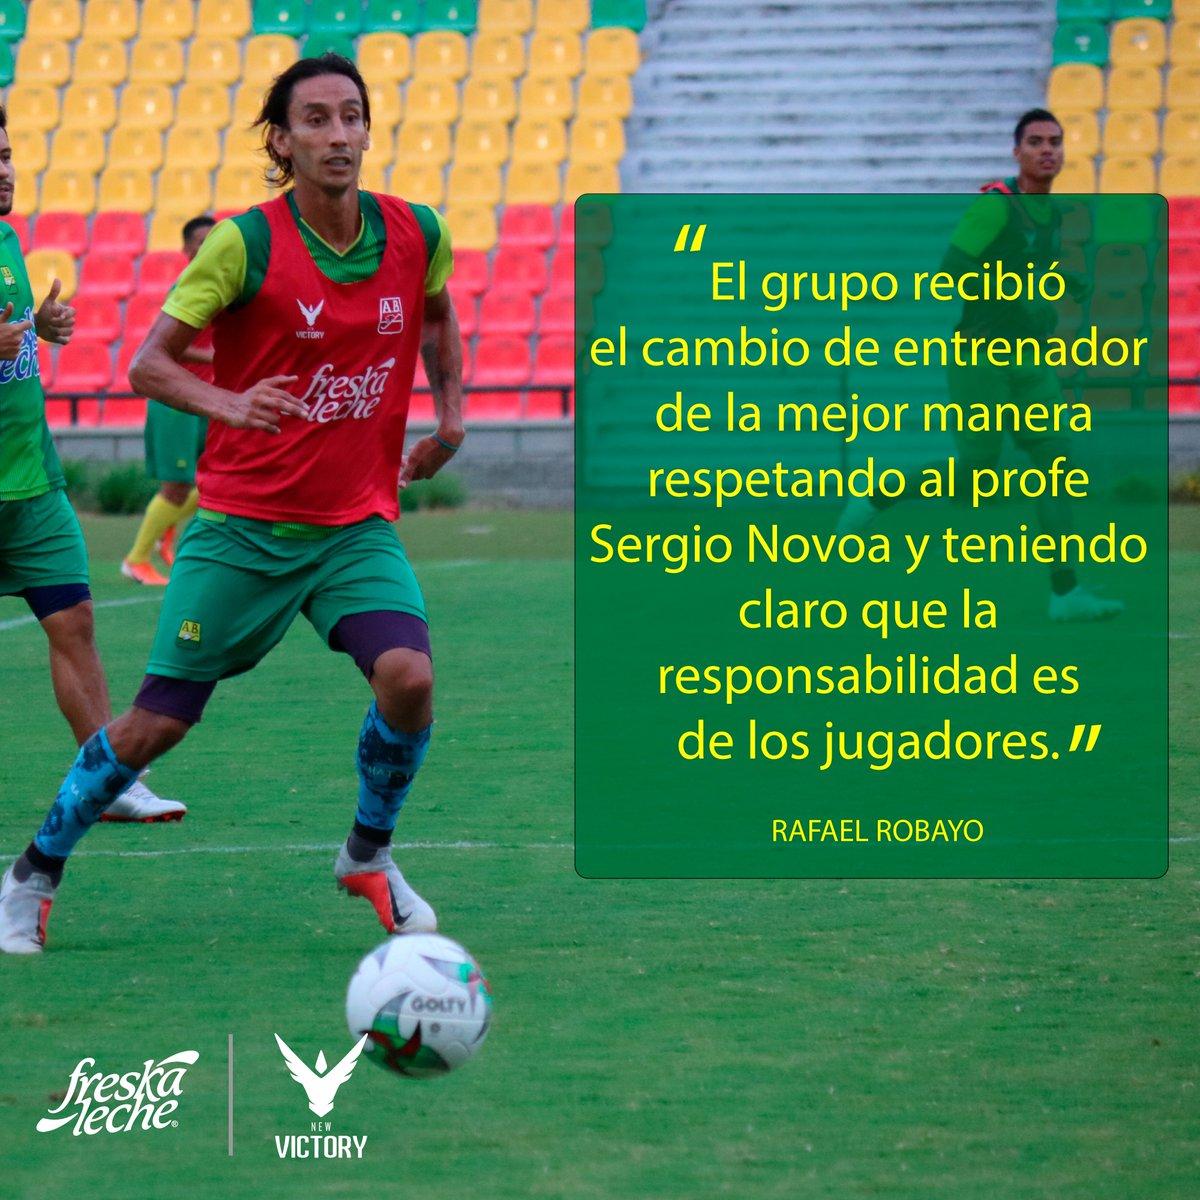 Atletico Bucaramanga On Twitter Profesionalmasculino Hablaelleopardo